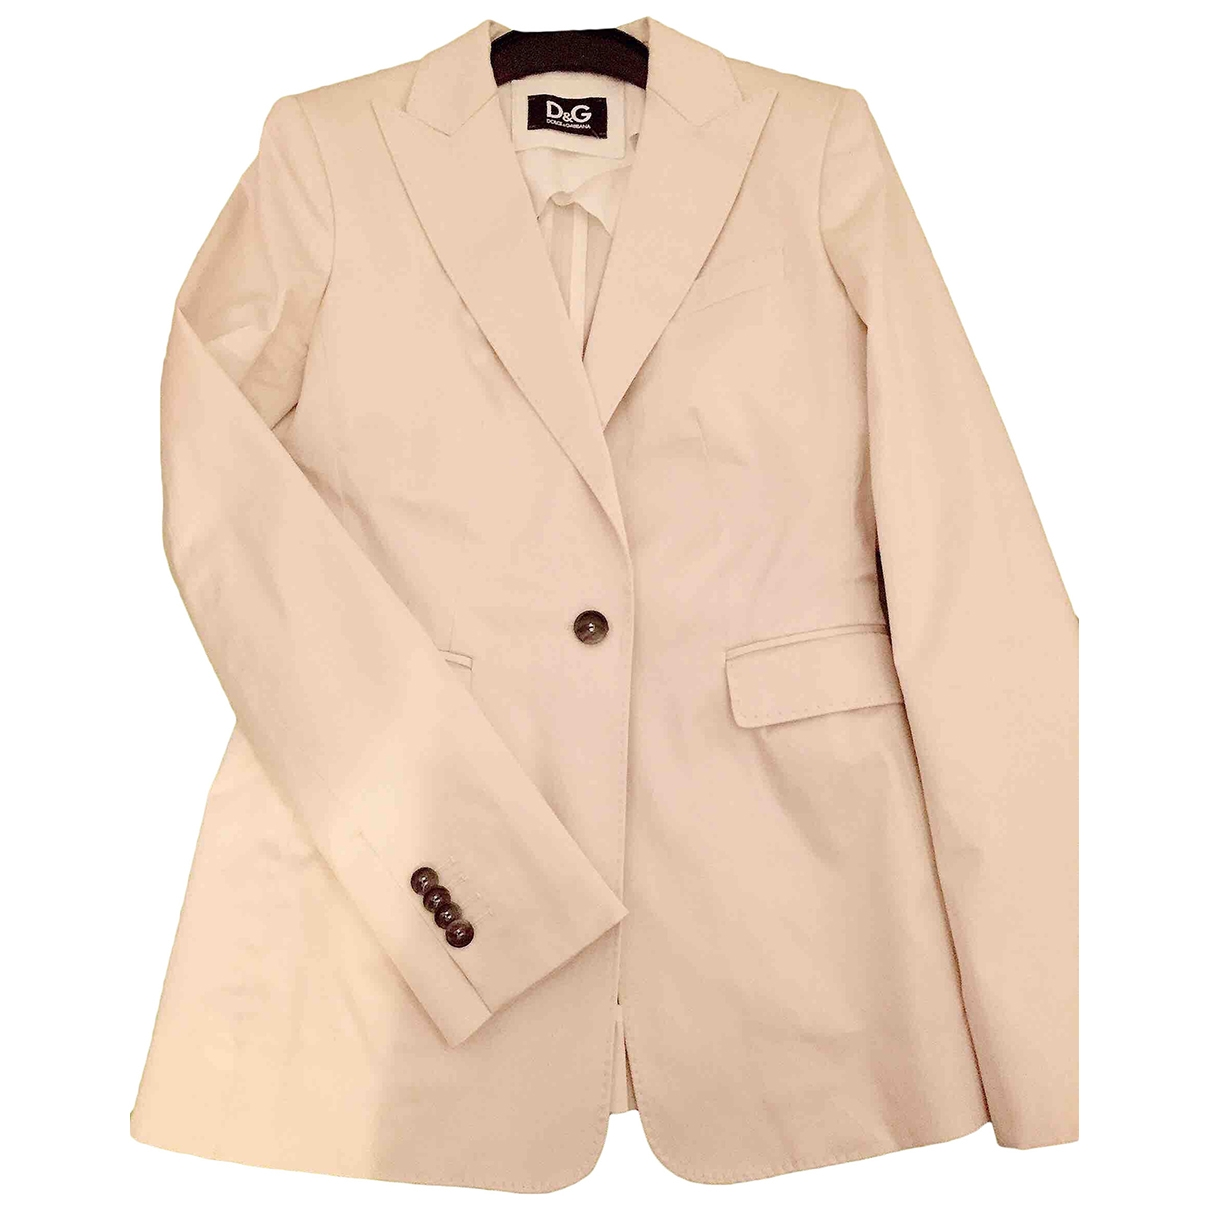 D&g \N White Cotton jacket for Women 40 IT